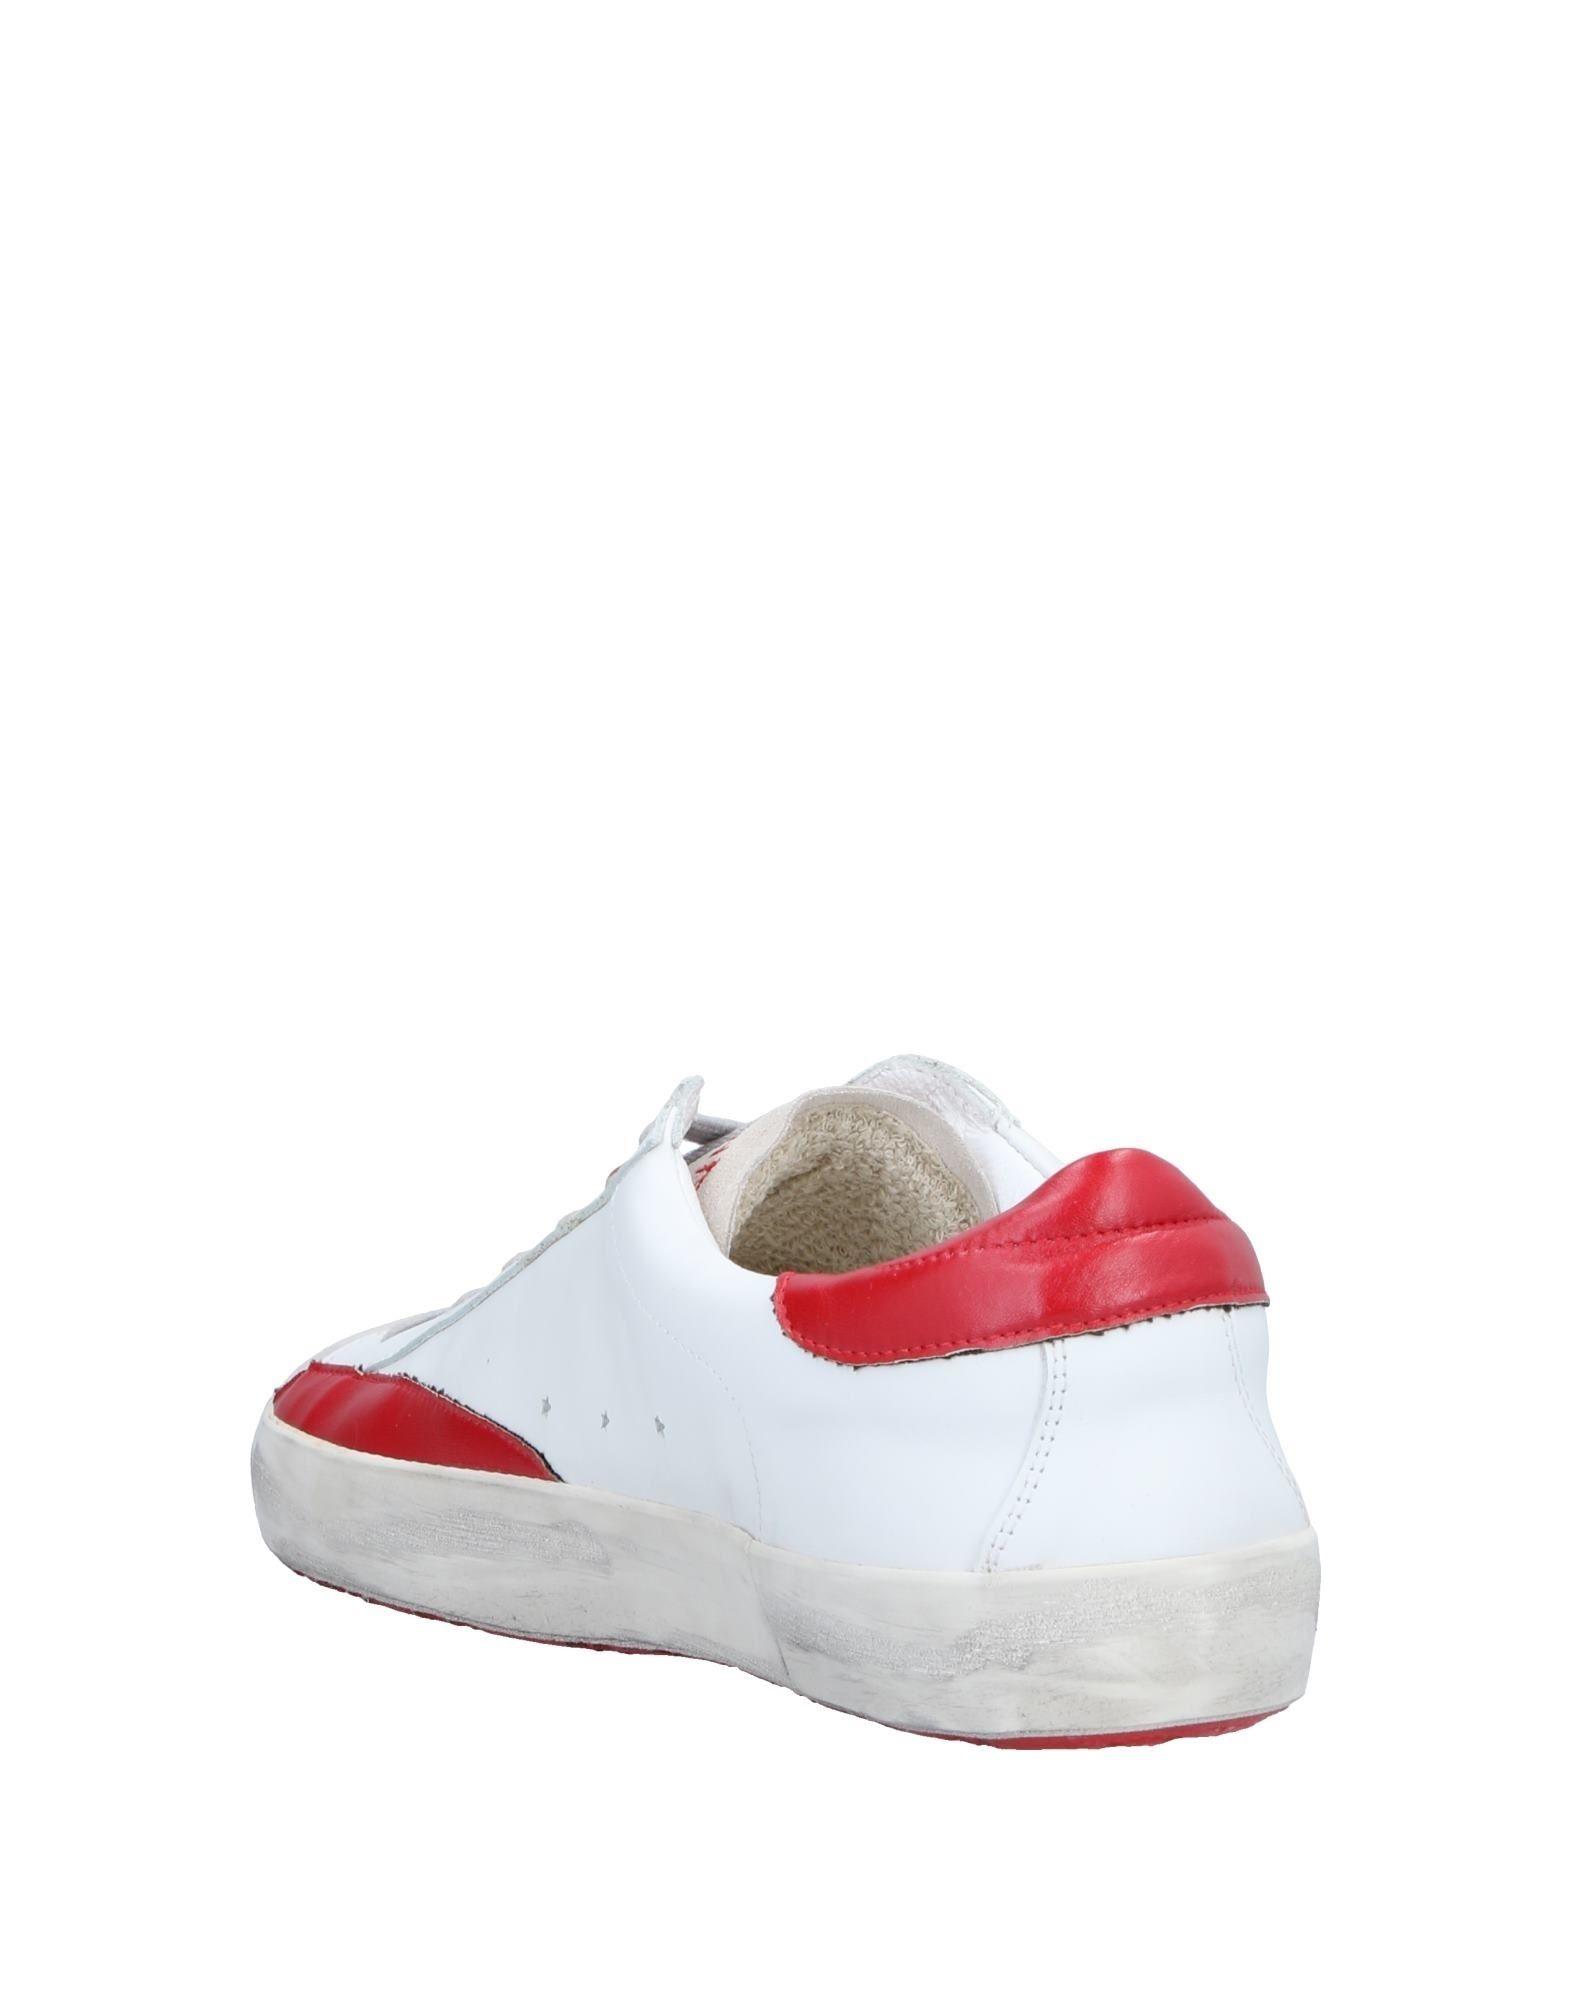 Ishikawa Sneakers Herren  11543945KP Gute Qualität beliebte Schuhe